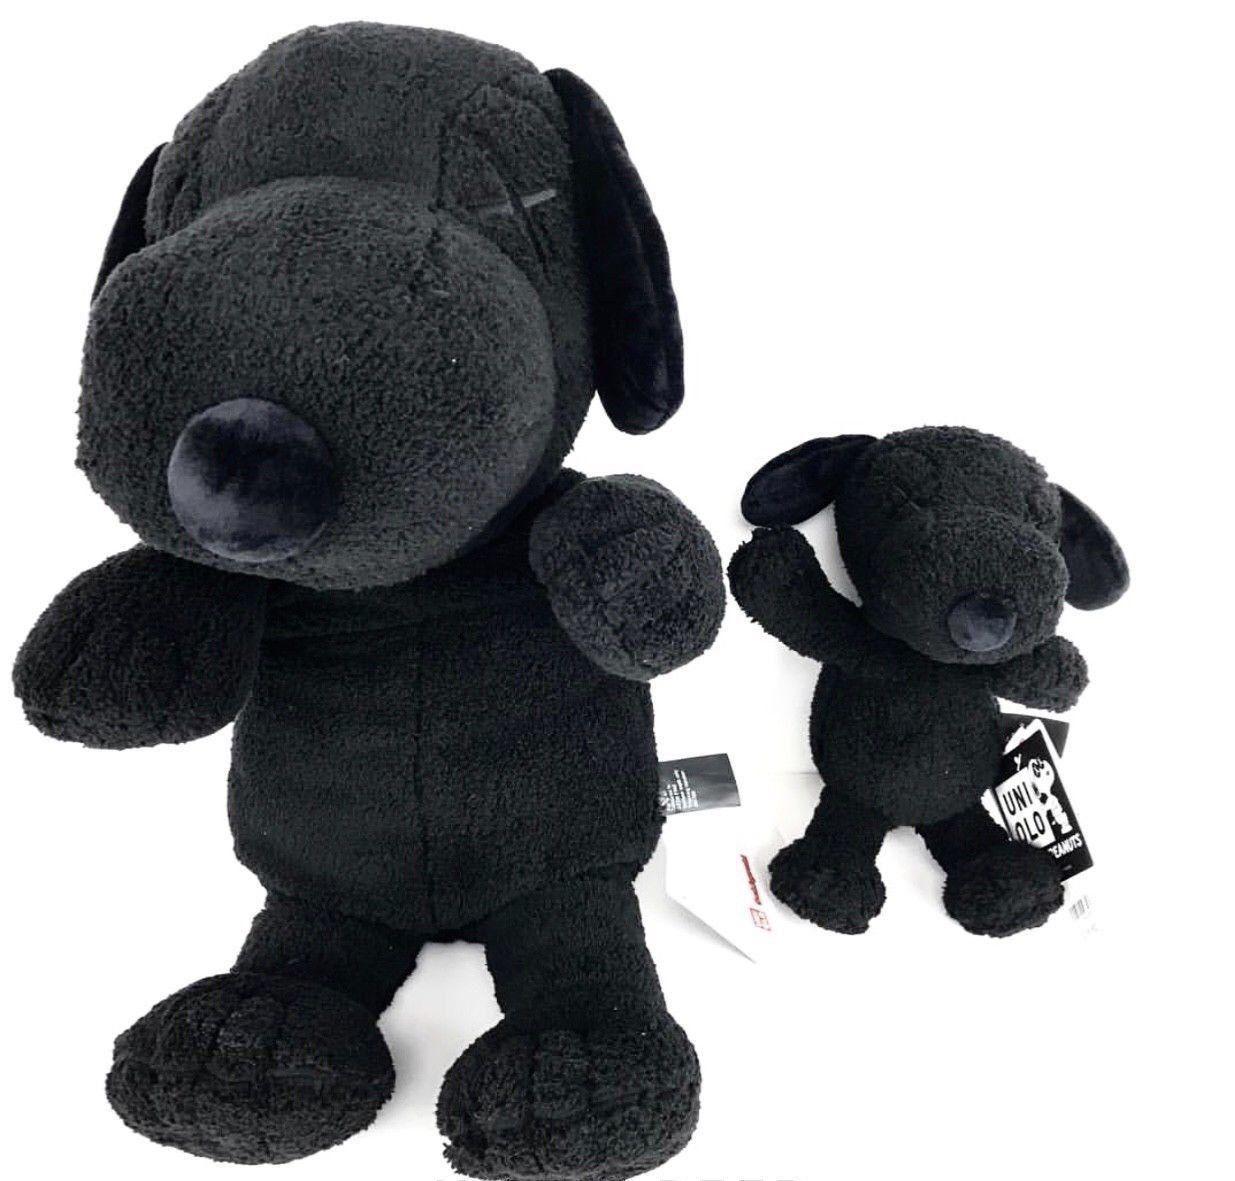 Japan Uniqlo x Kaws x Peanuts Snoopy Plush Toy Size Small Black